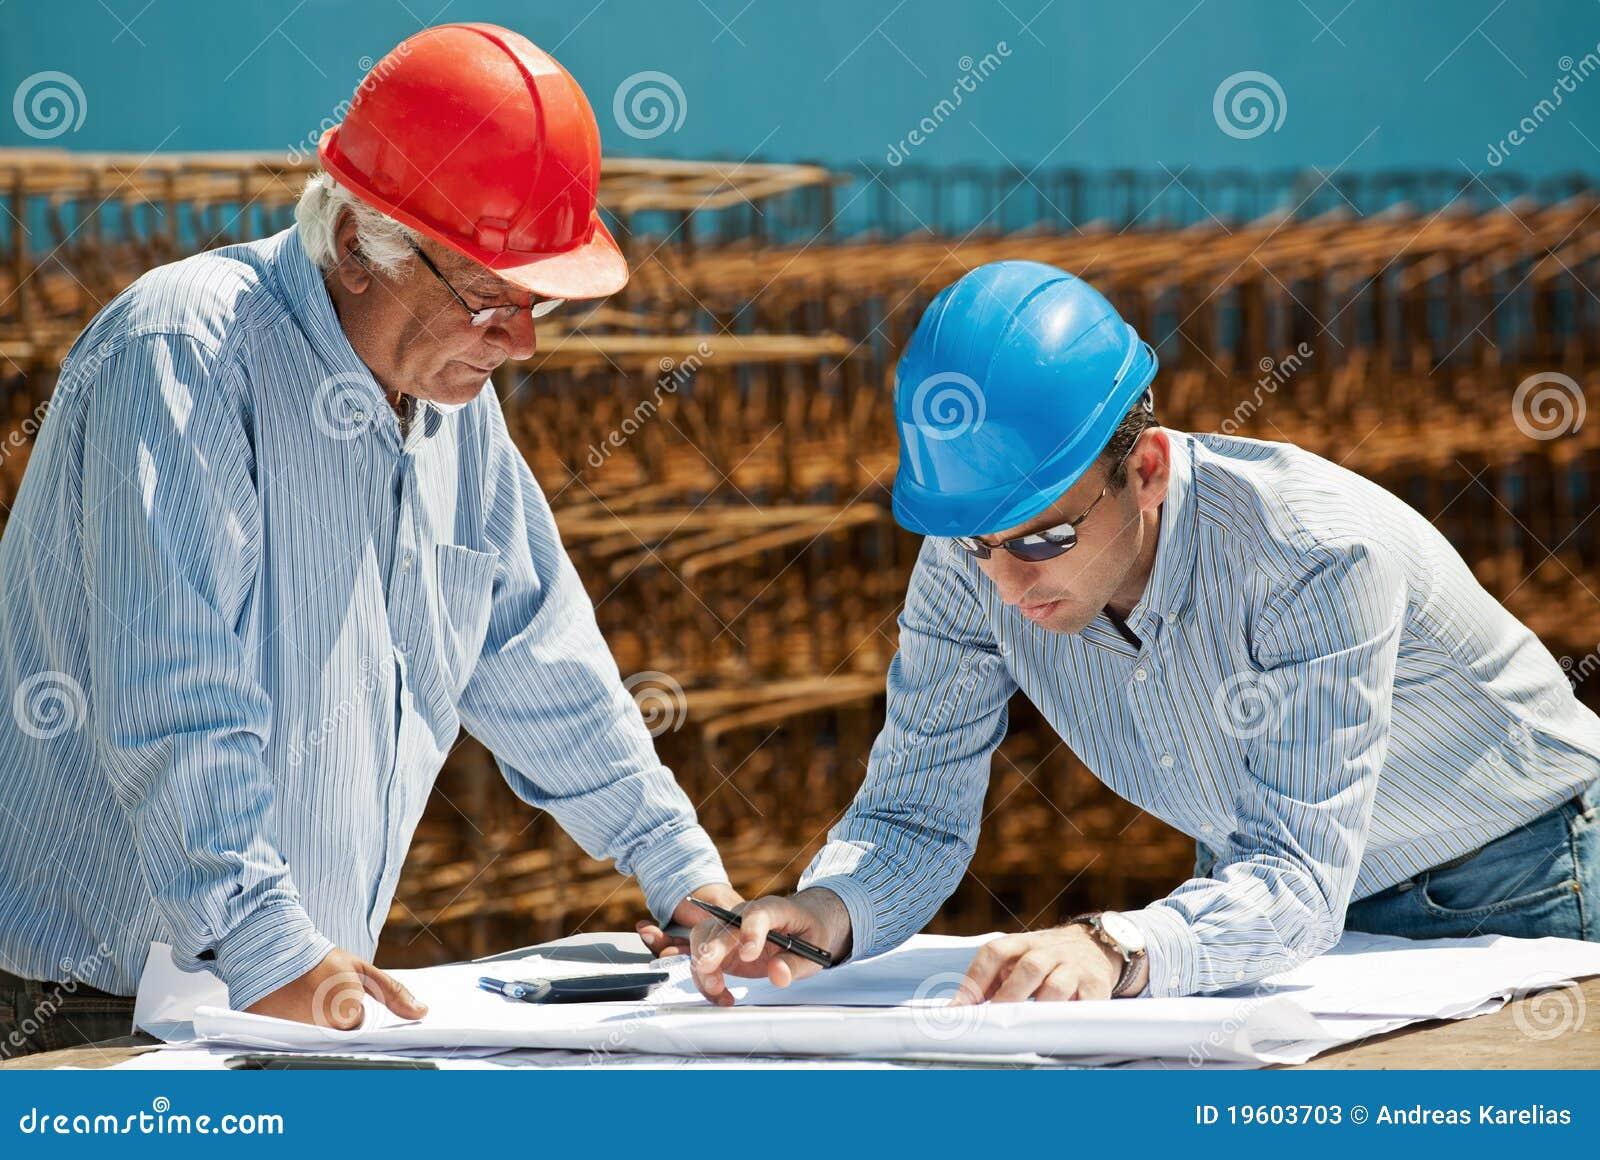 Ingeniero joven y capataz mayor